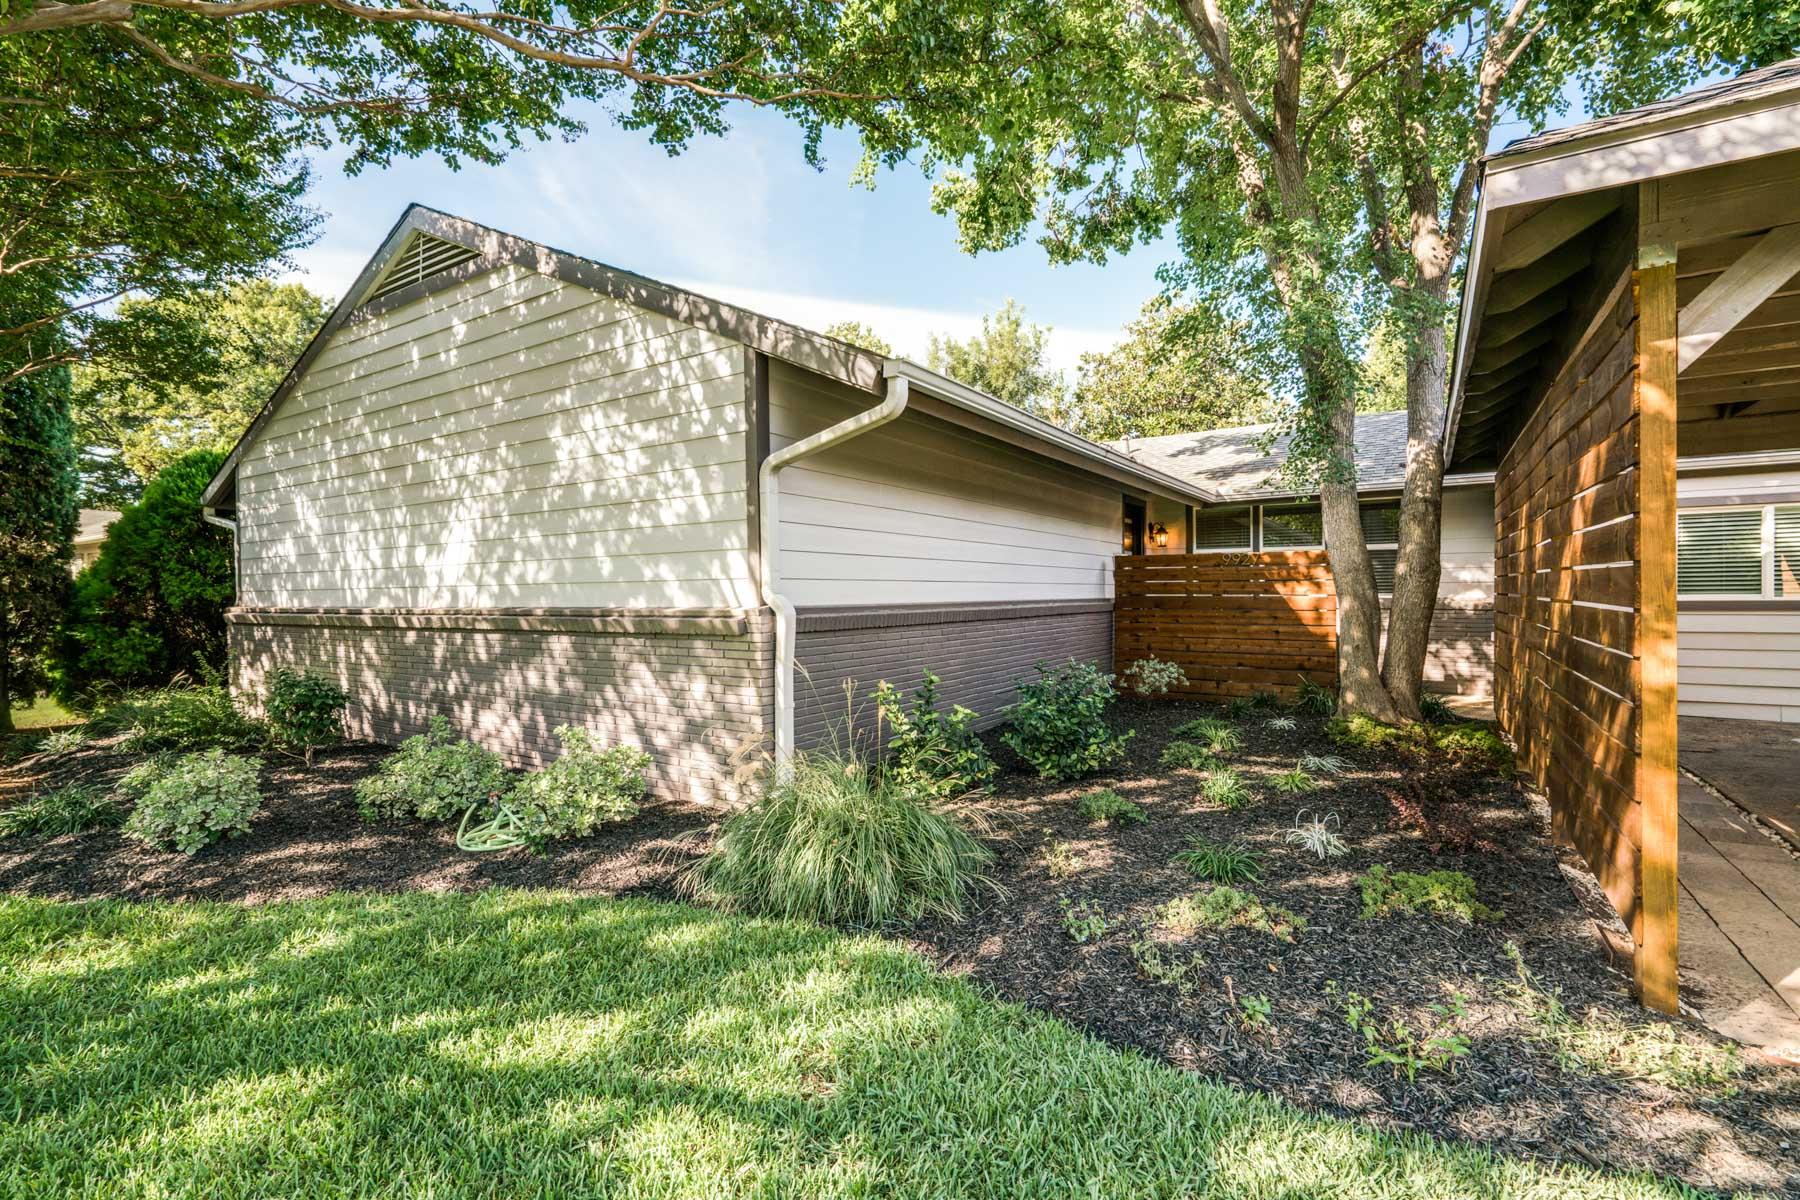 獨棟家庭住宅 為 出售 在 Midway Hollow Traditional 9927 Lenel Place Dallas, 德克薩斯州, 75220 美國